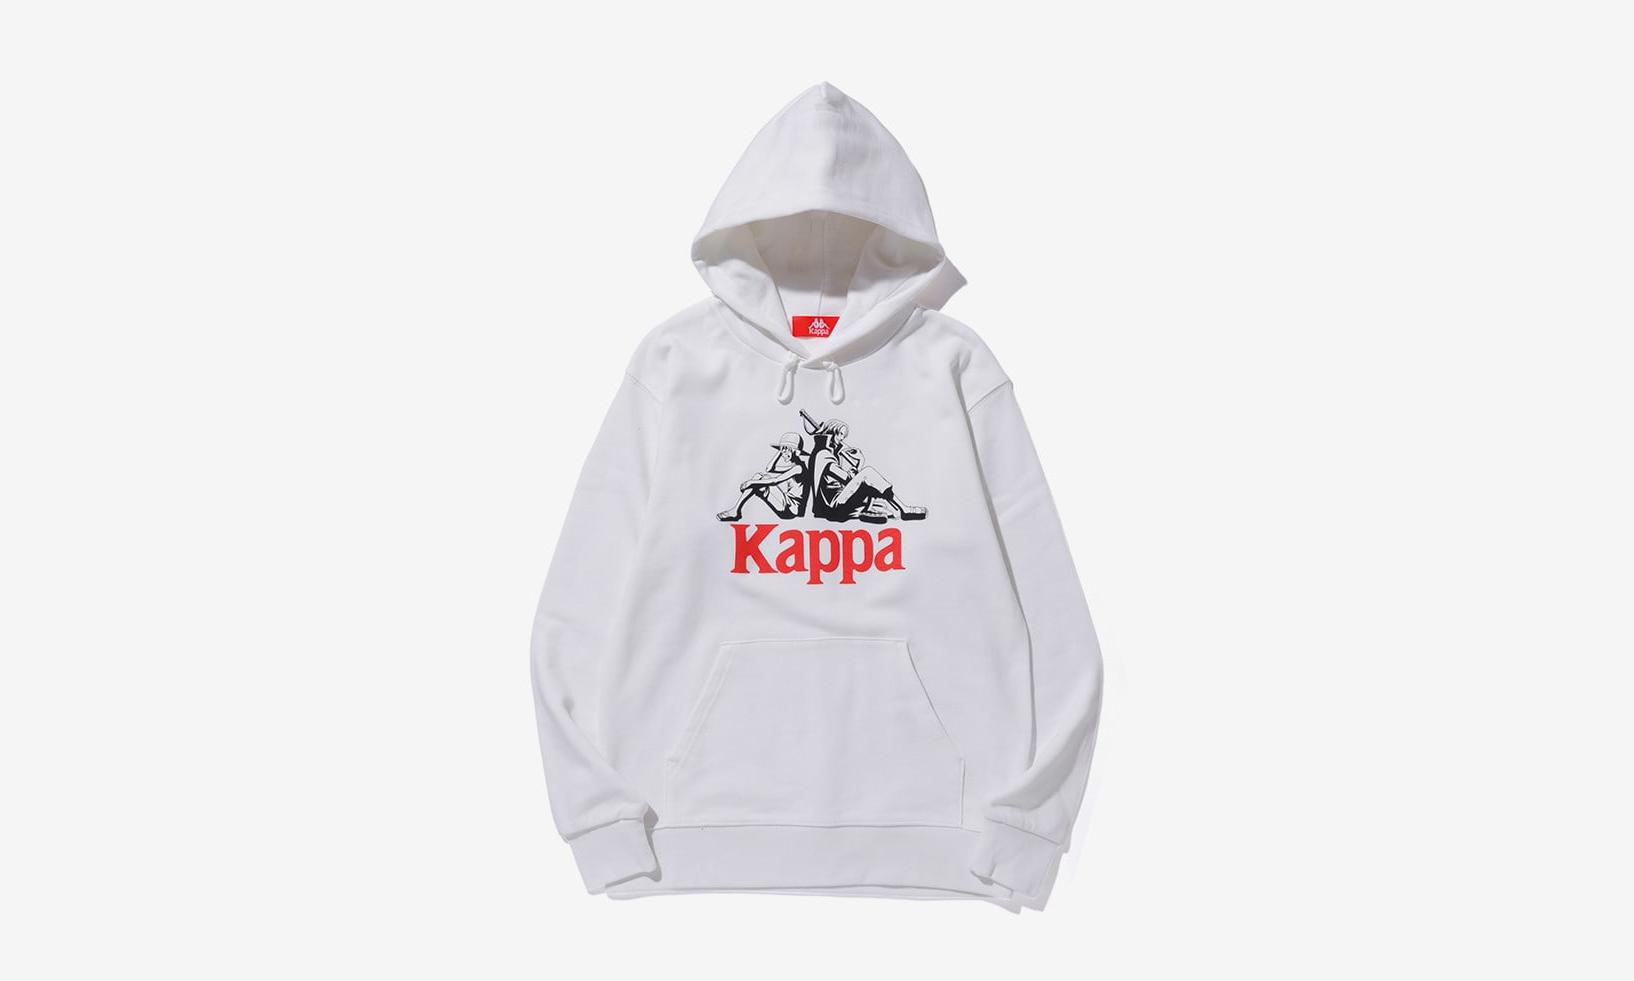 KAPPA JAPAN 与《海贼王》合作,释出全新胶囊系列